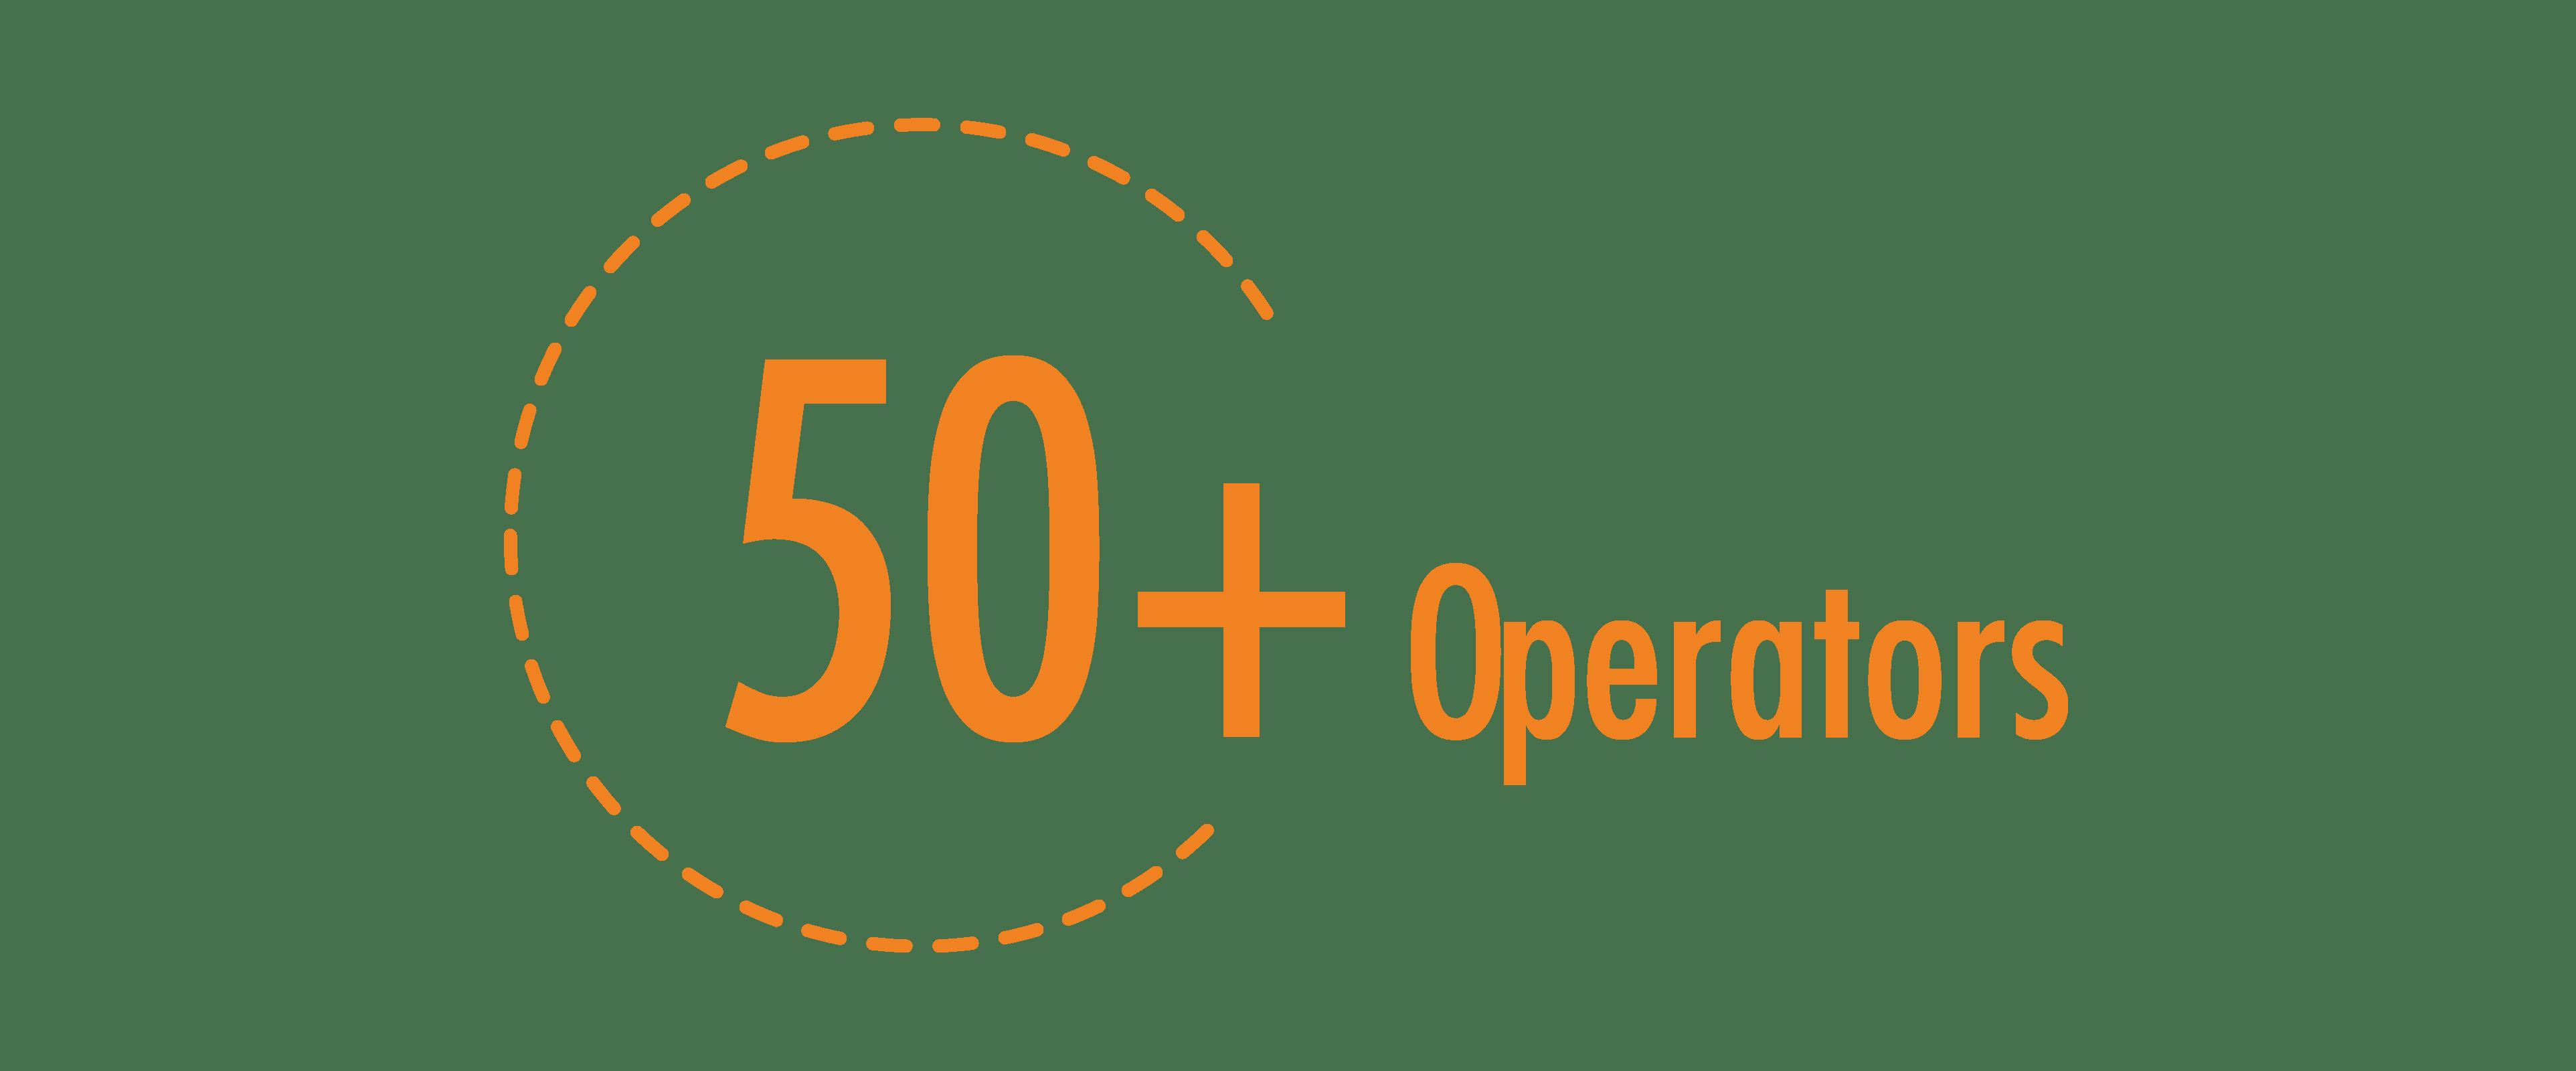 number of operators 50